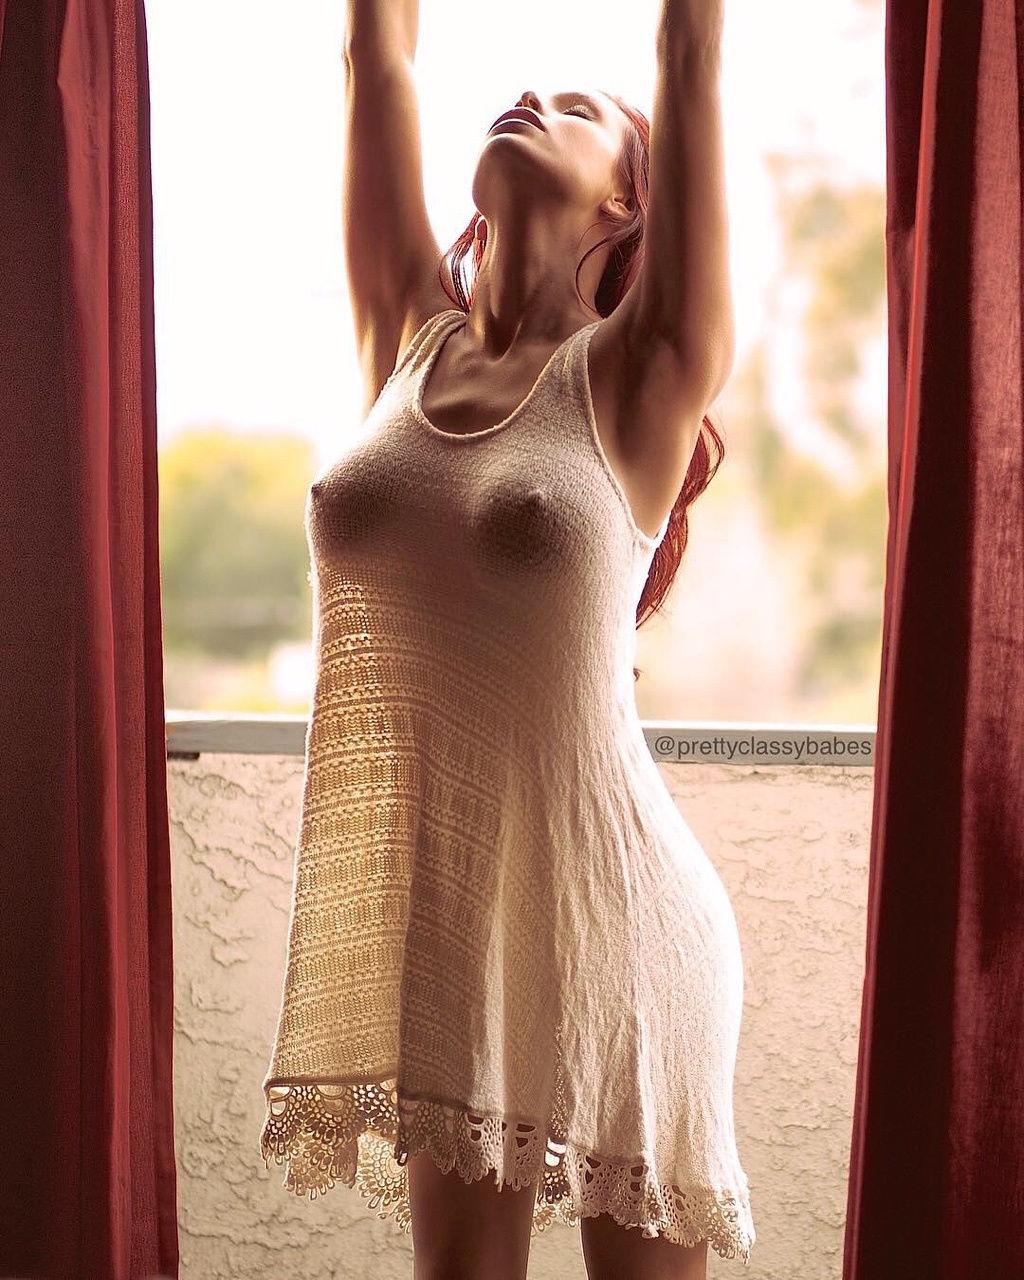 Sweet figure..awesome tits..